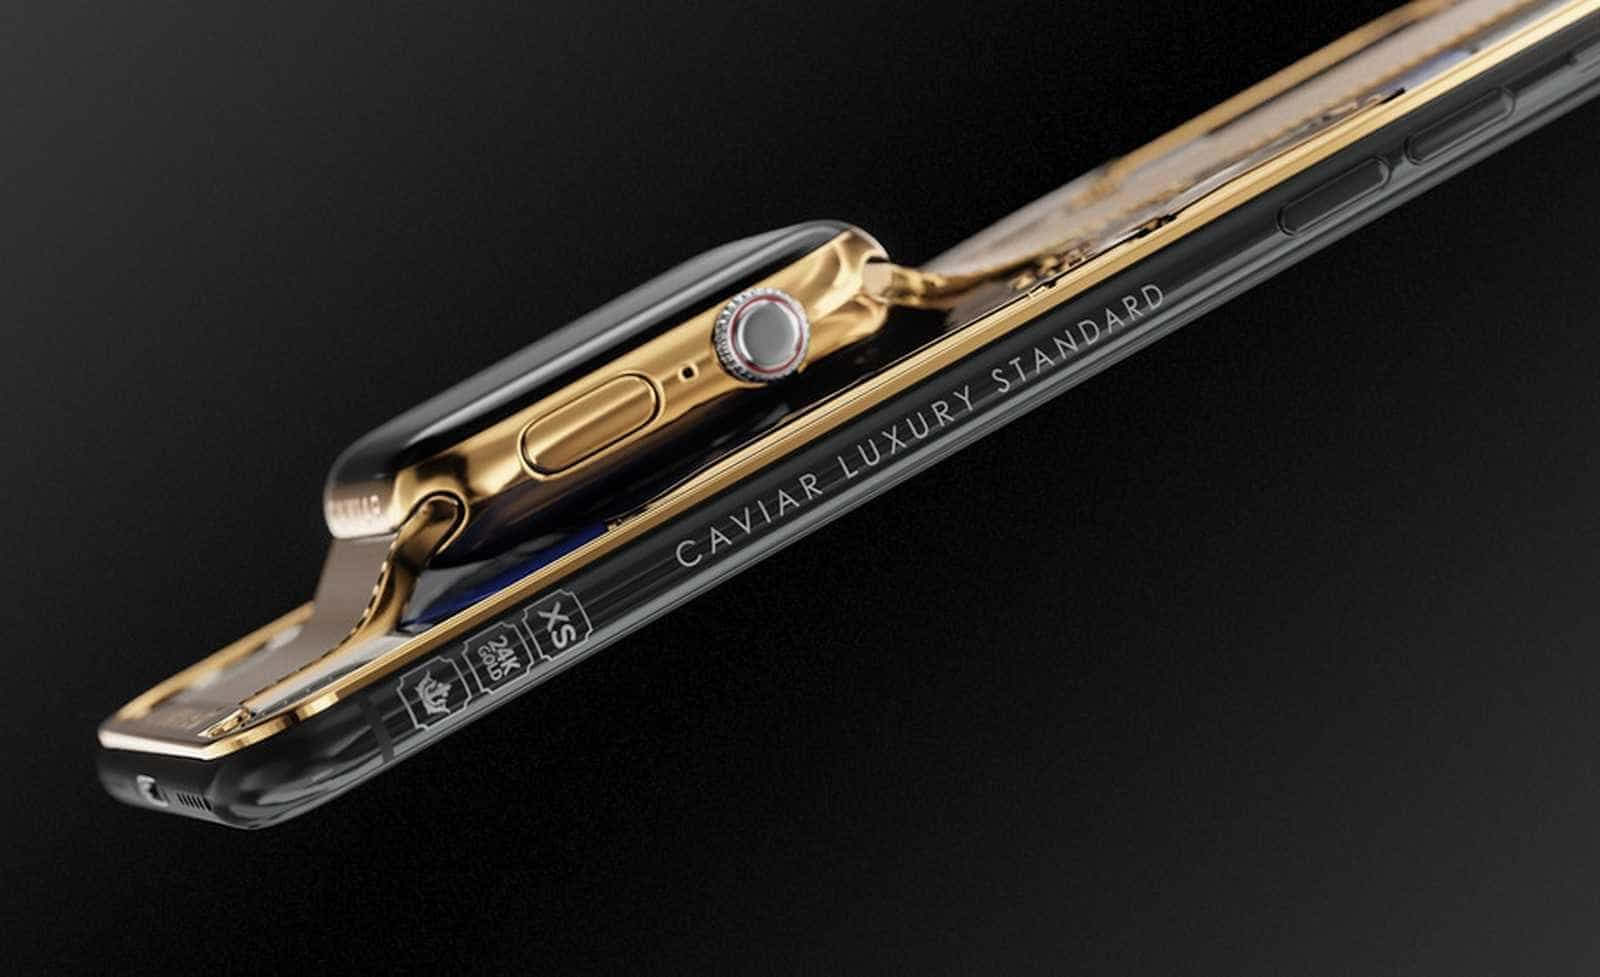 Novo iPhone pode custar até R$ 83 mil na Rússia